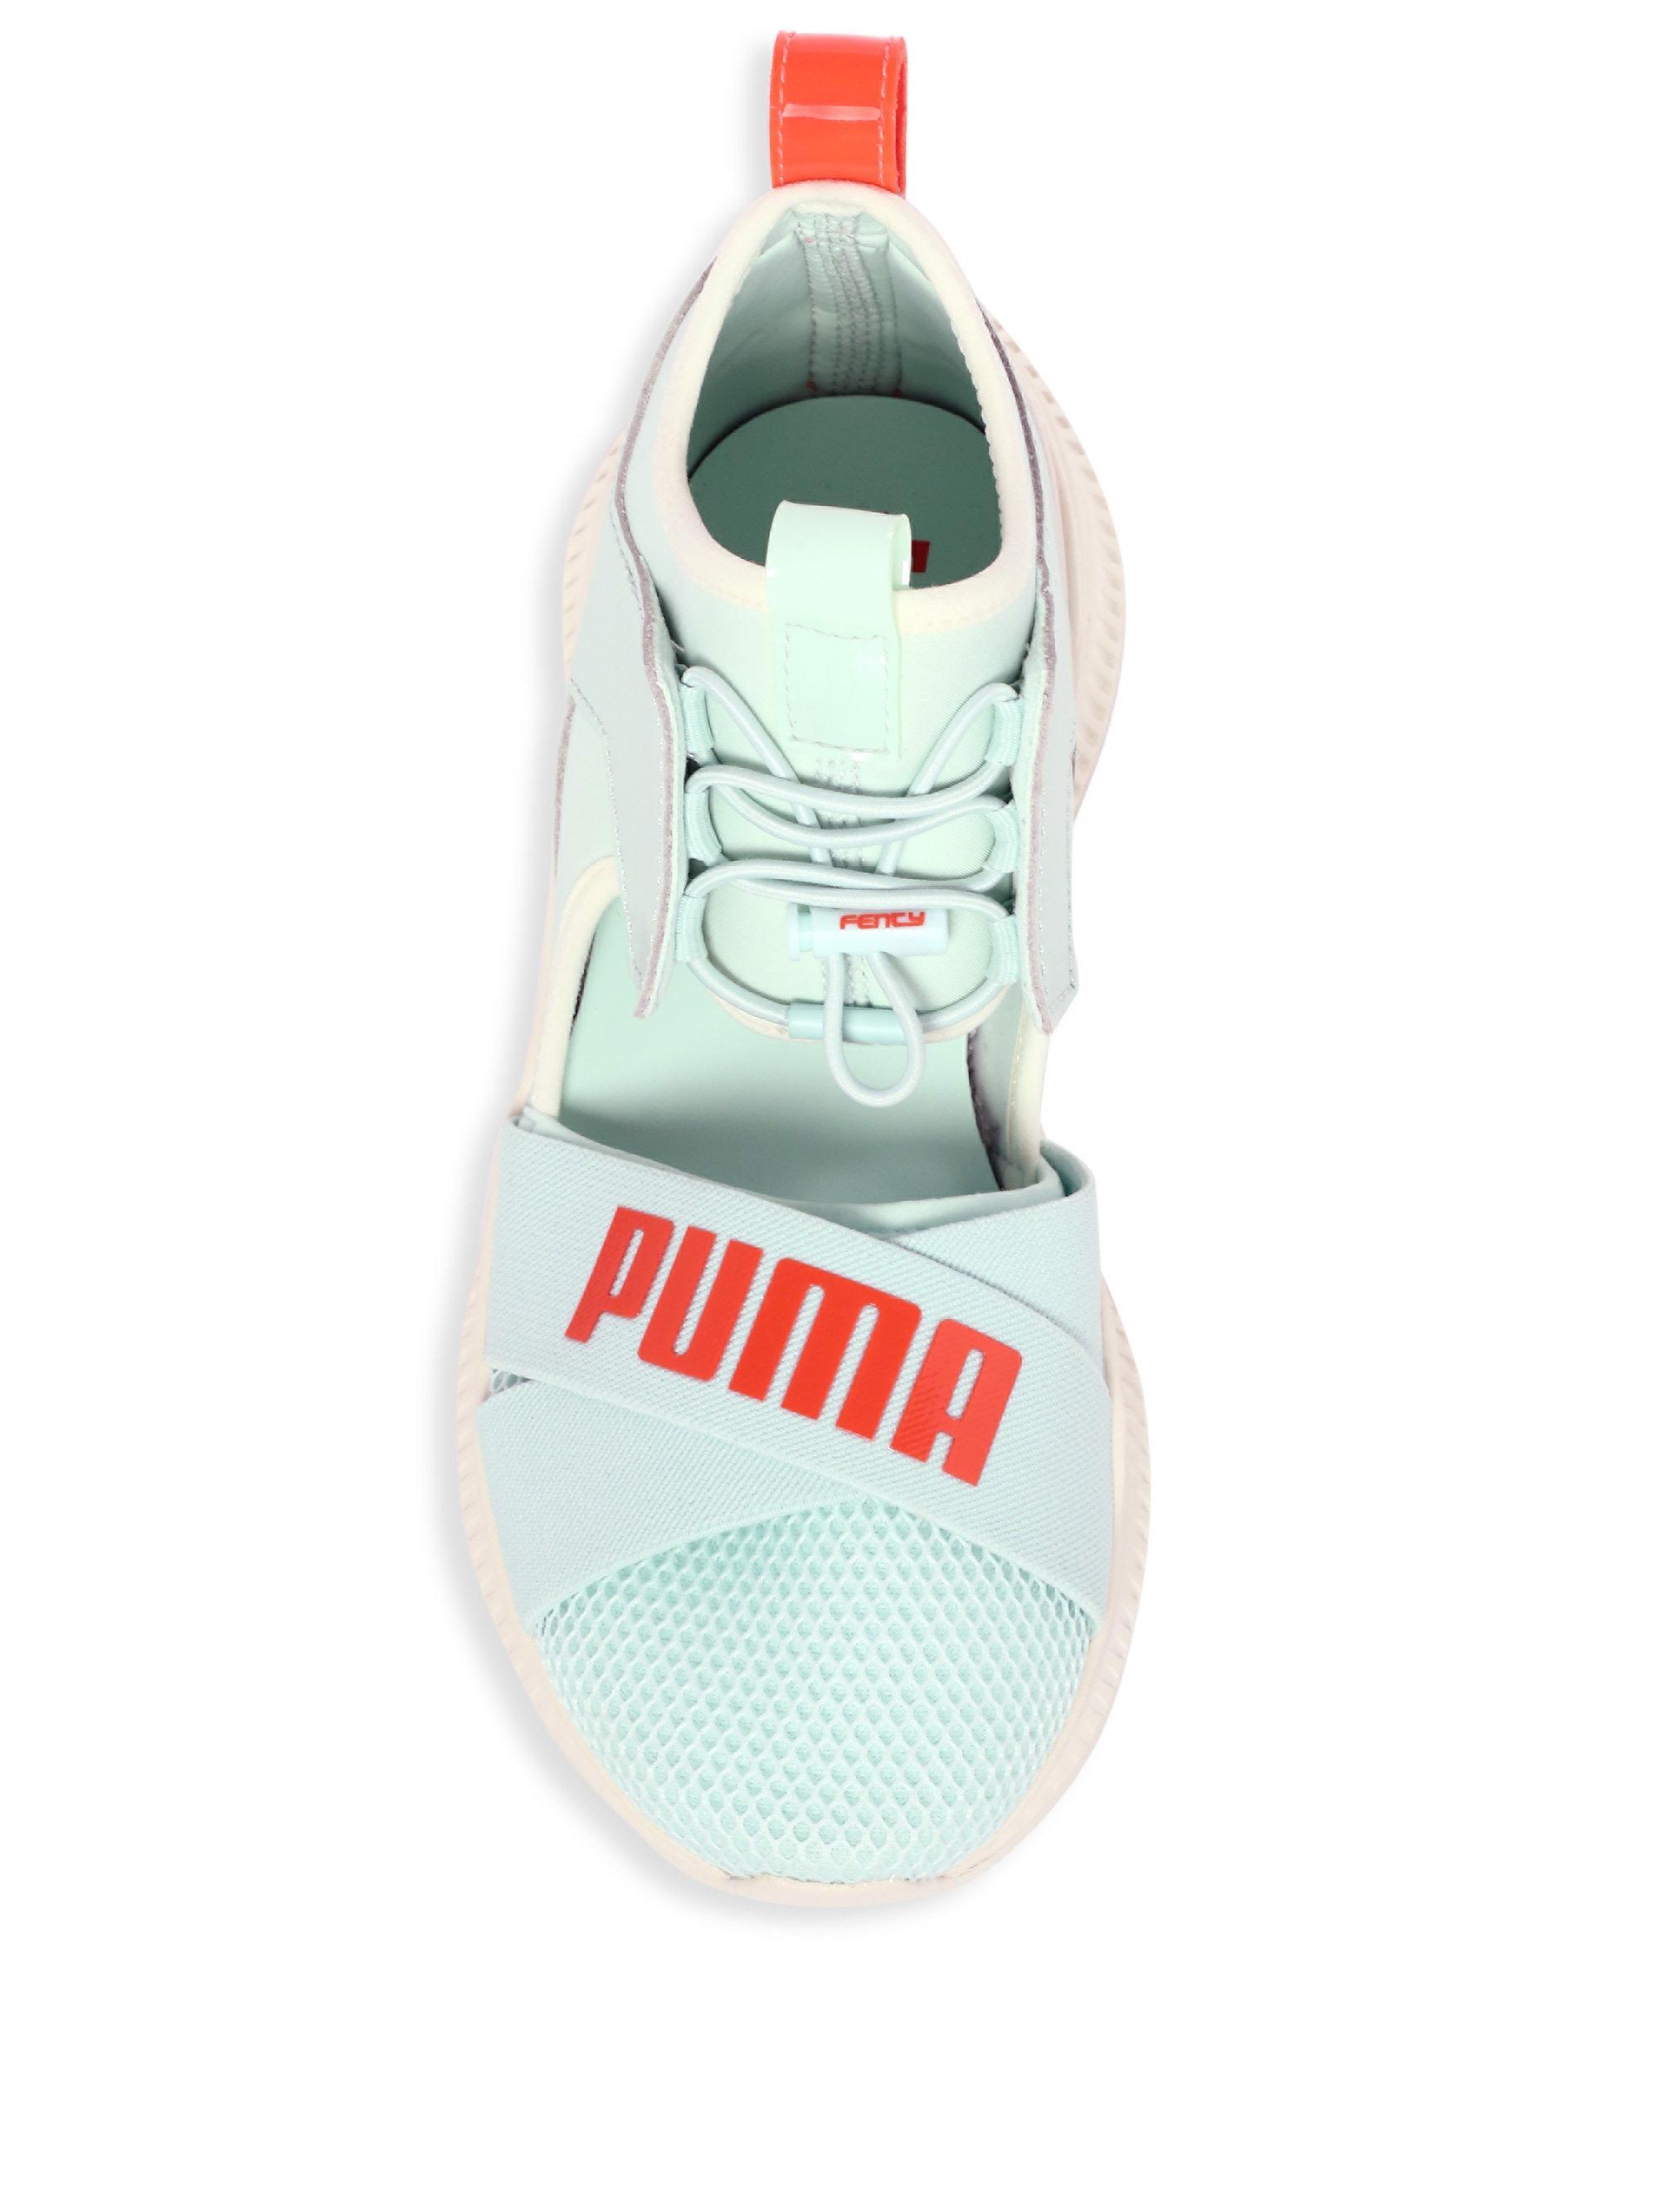 best cheap 15872 a4552 PUMA Fenty Avid Cut-out Sneakers in Blue - Lyst